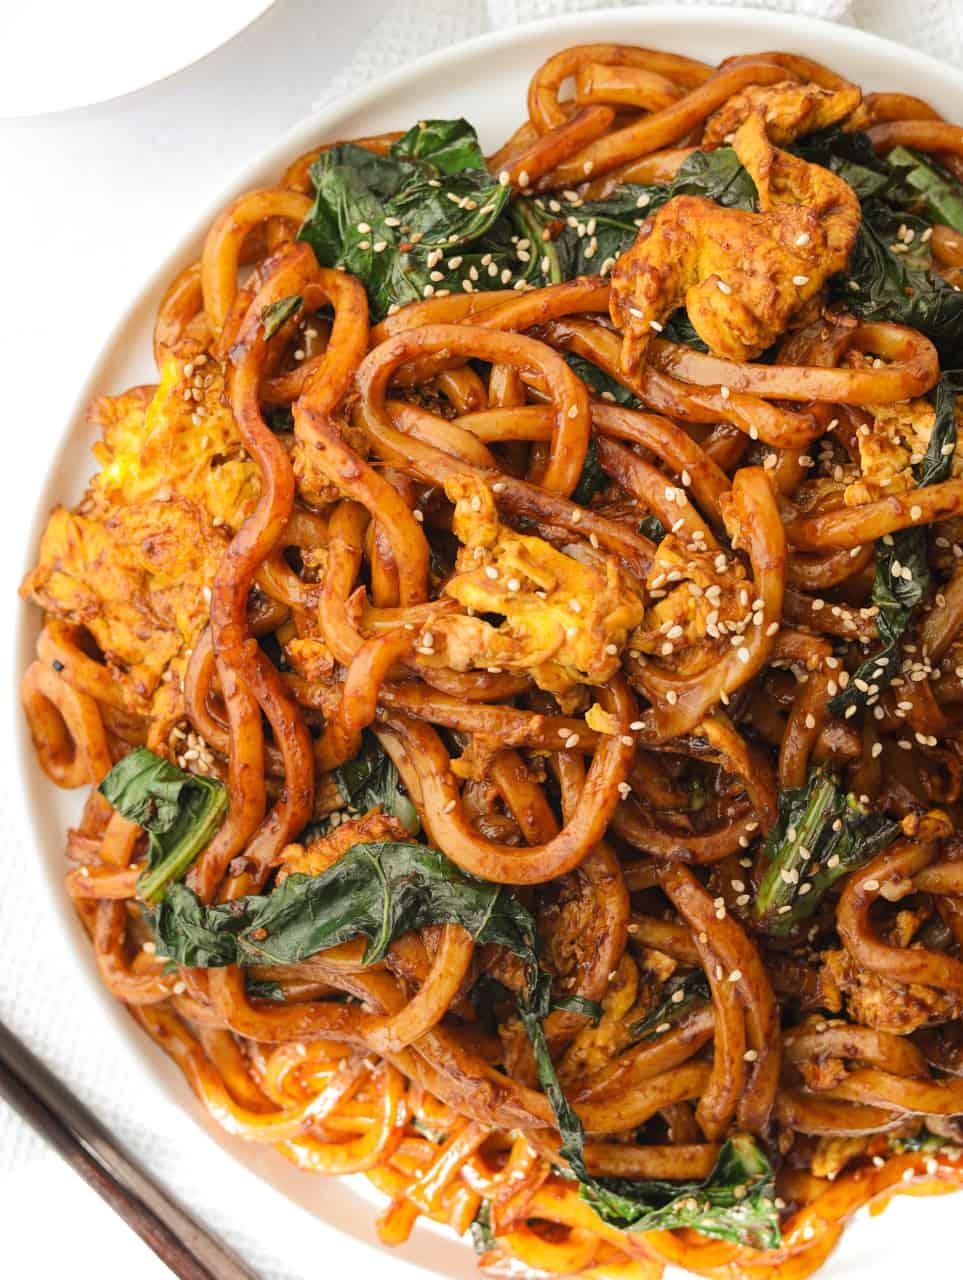 Soy Egg Udon Stir Fry